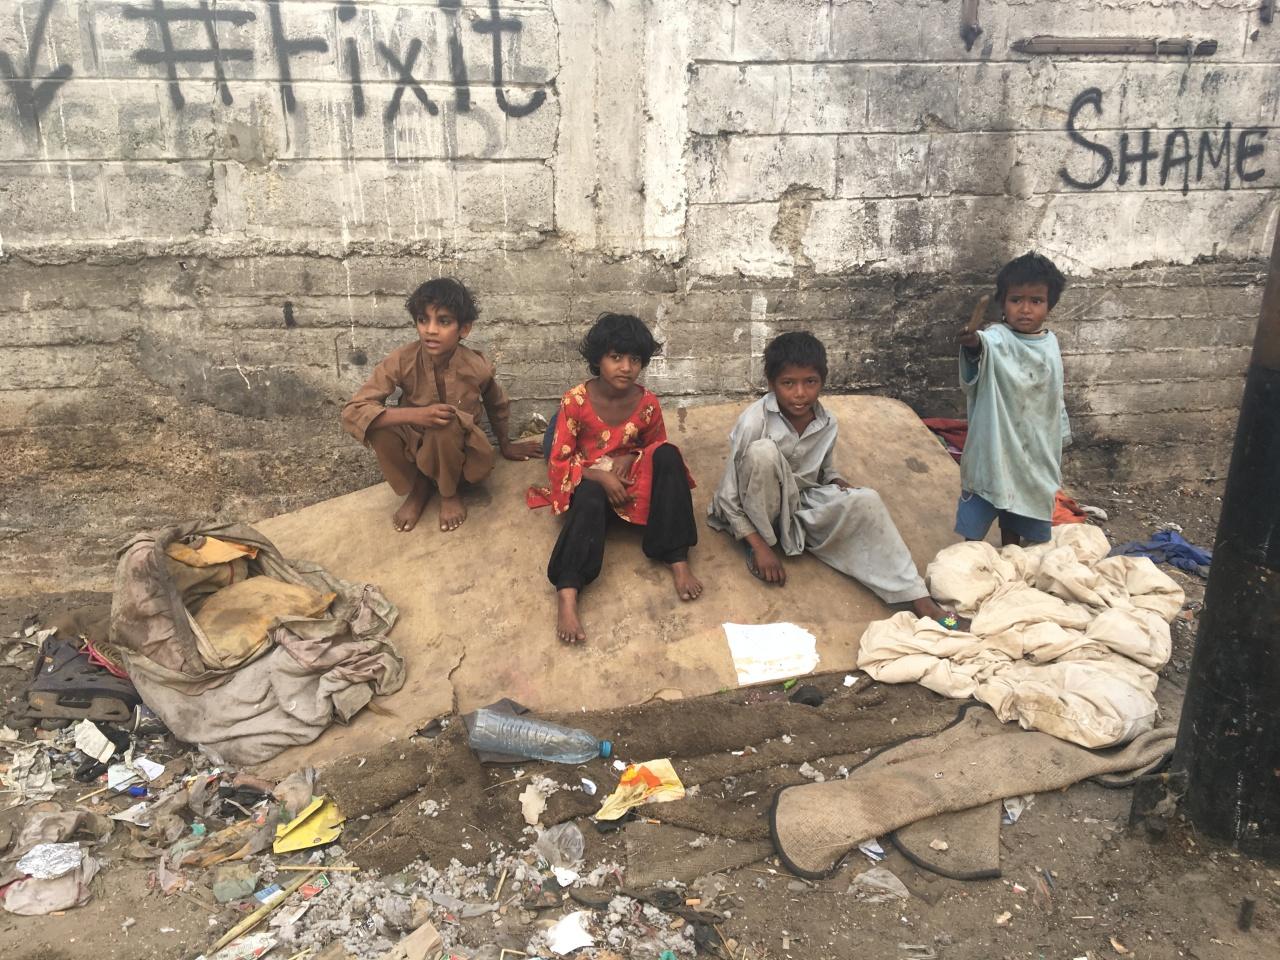 The plight of streetchildren